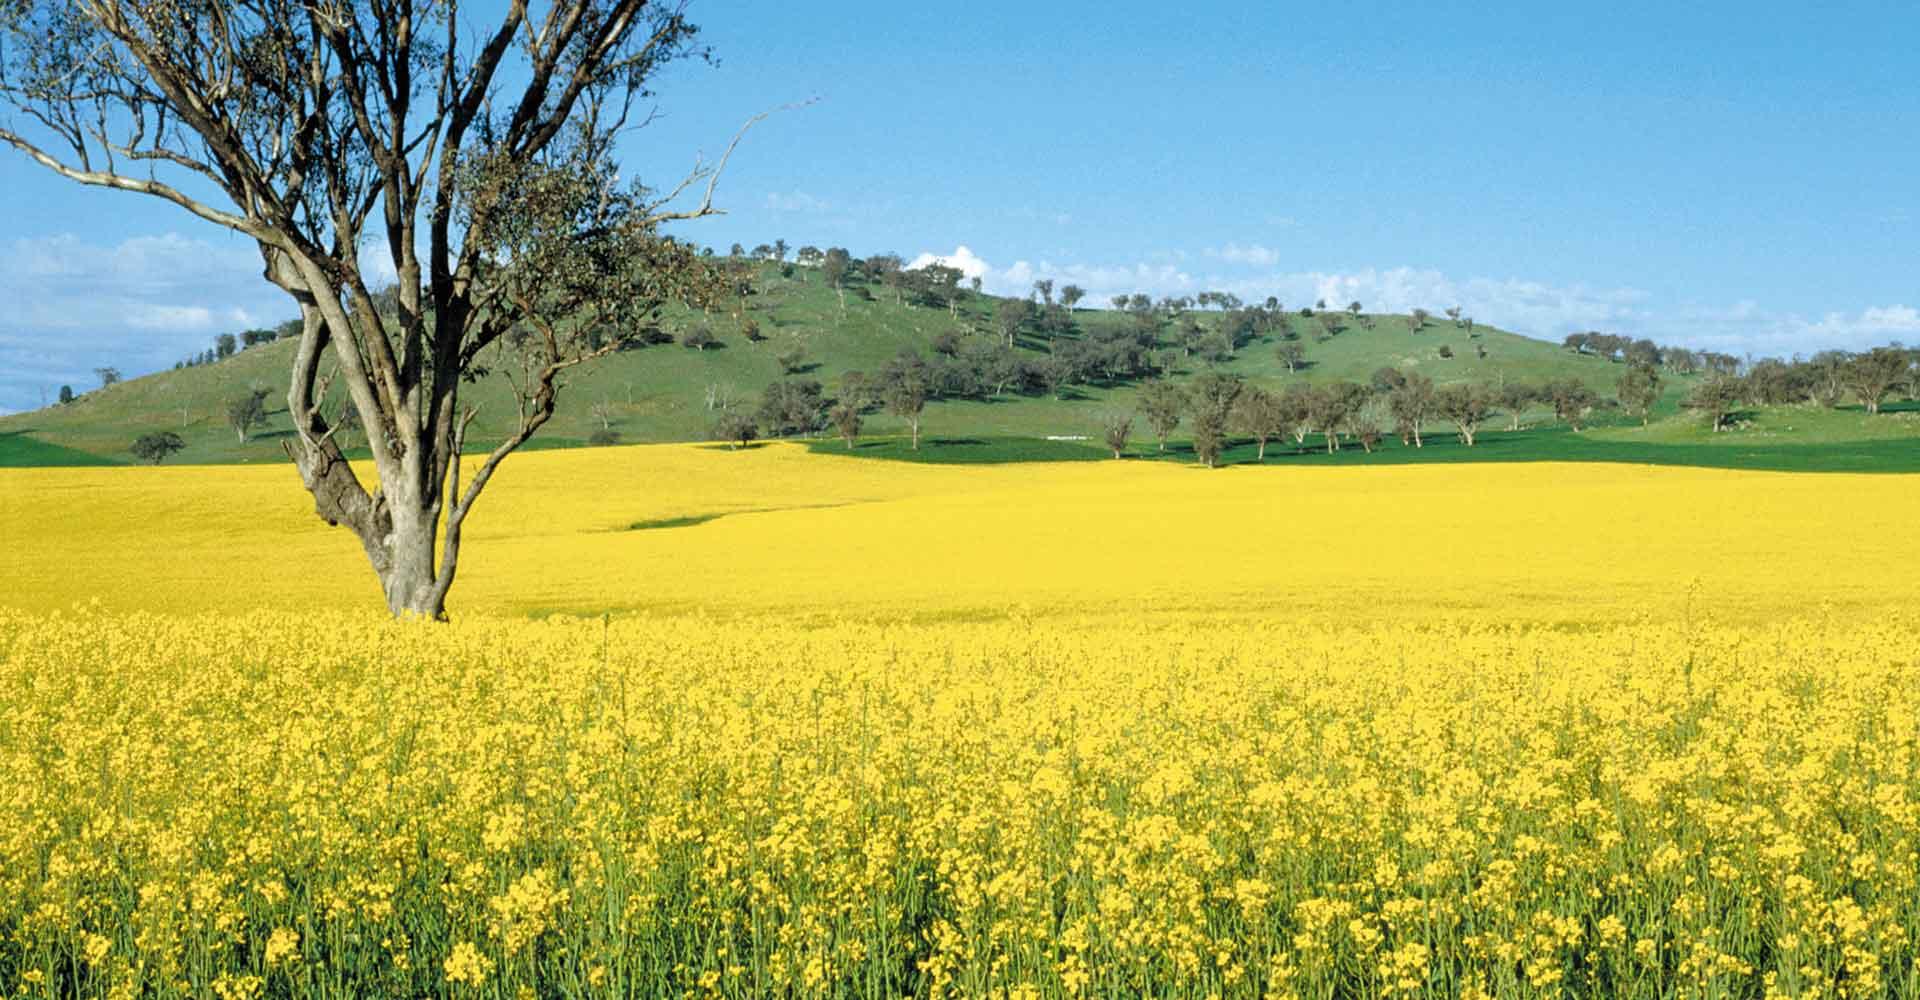 Agricultural farming crop.